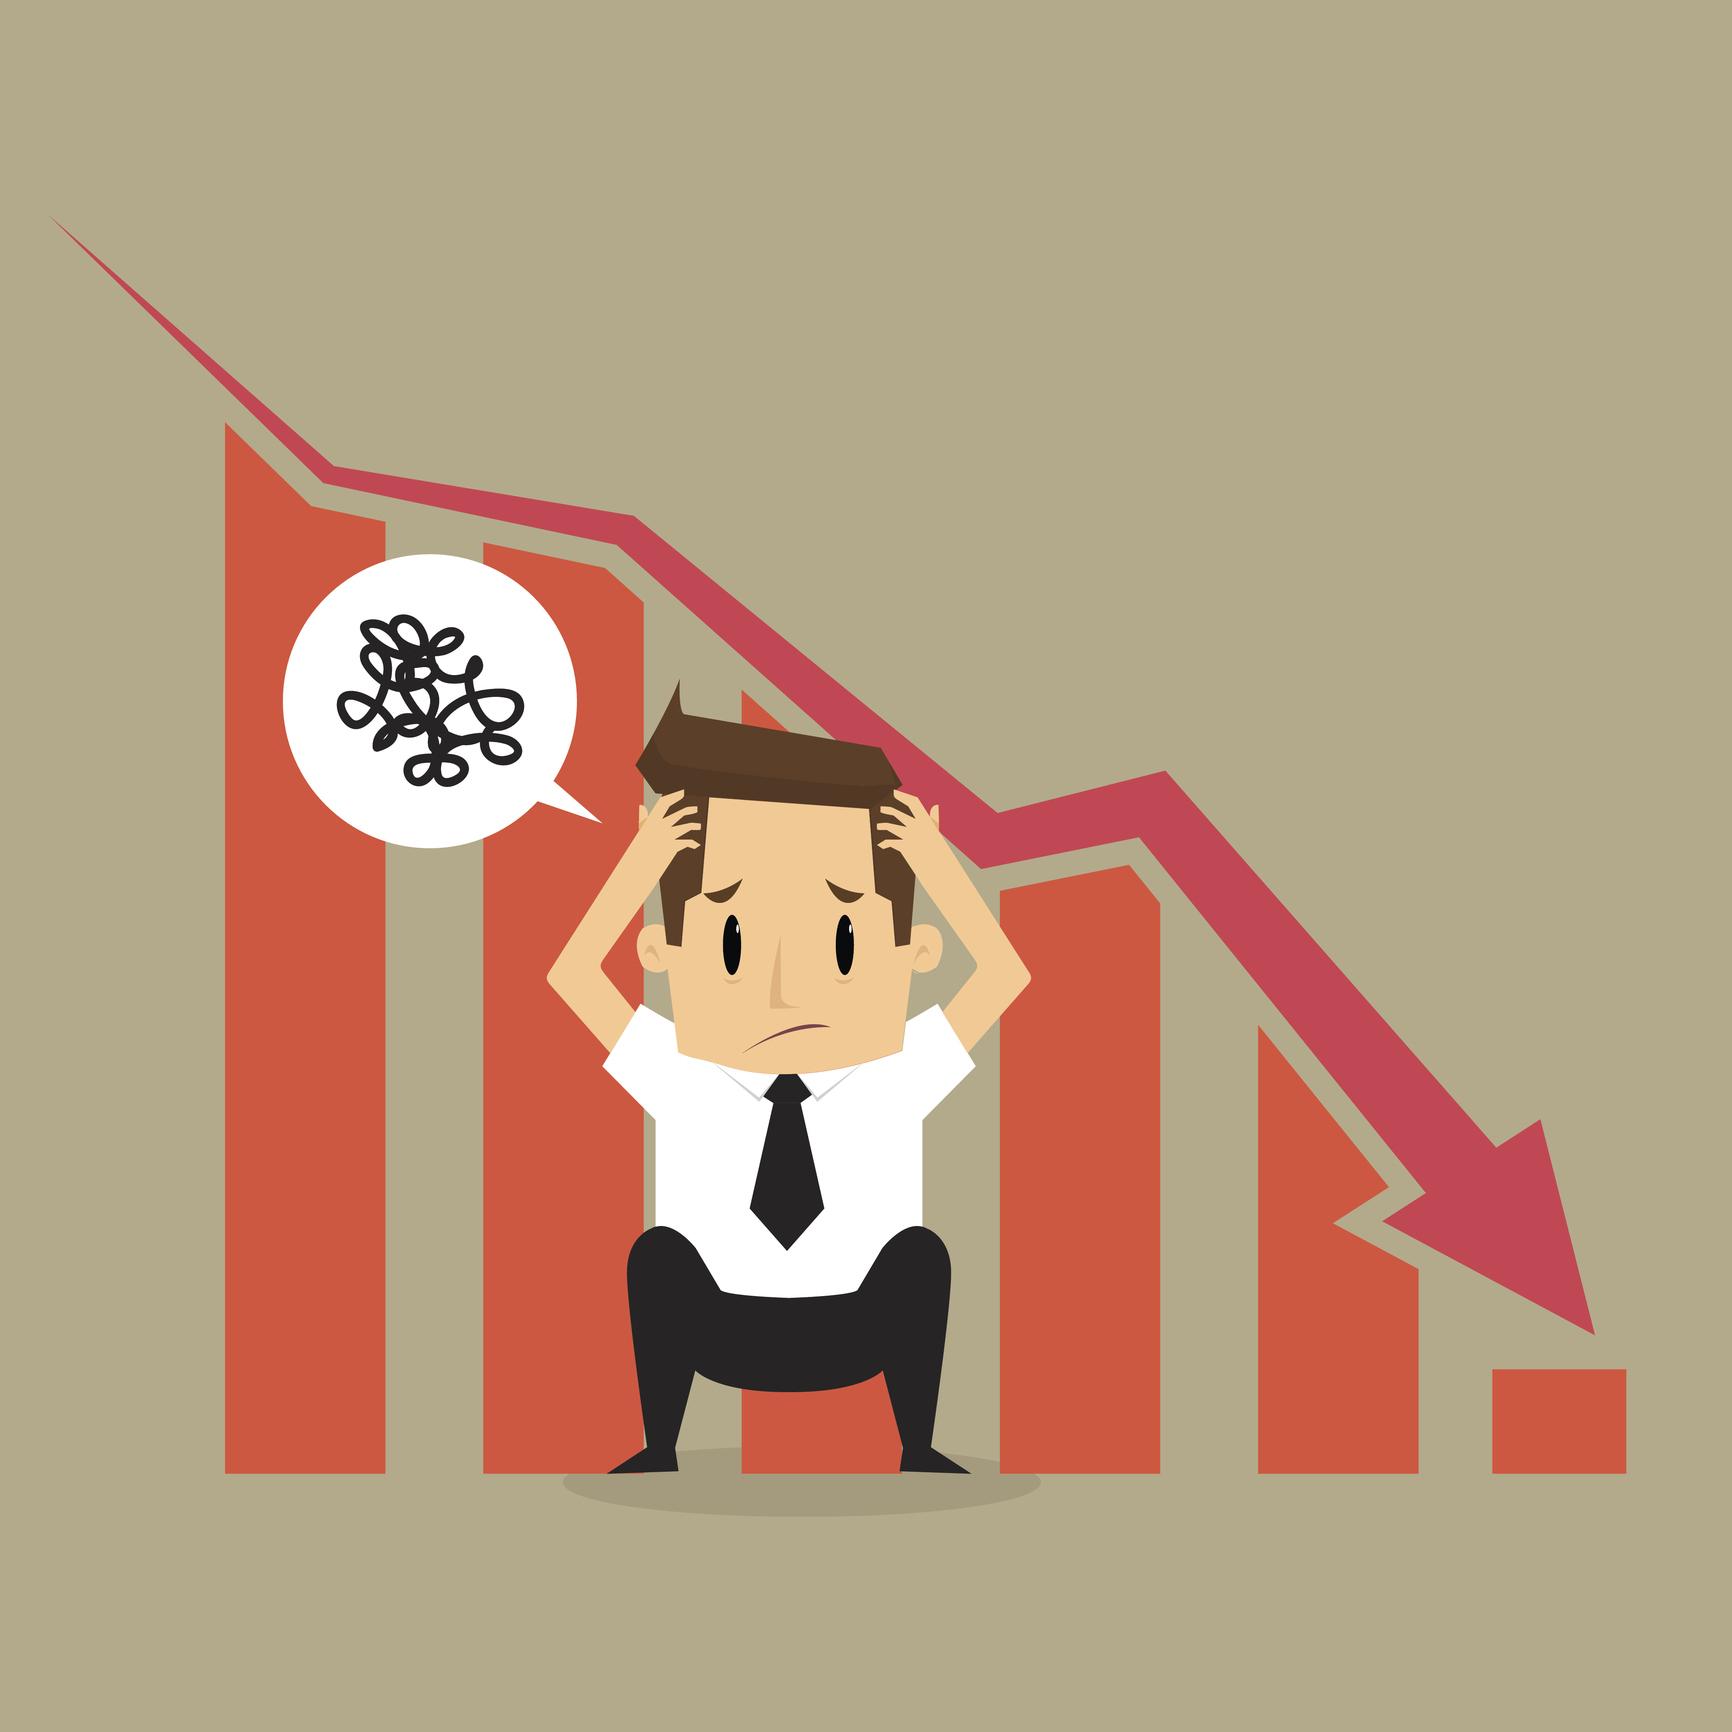 Cartoon of a broker distressed as a graph behind him forms a downward line, signaling a market crash